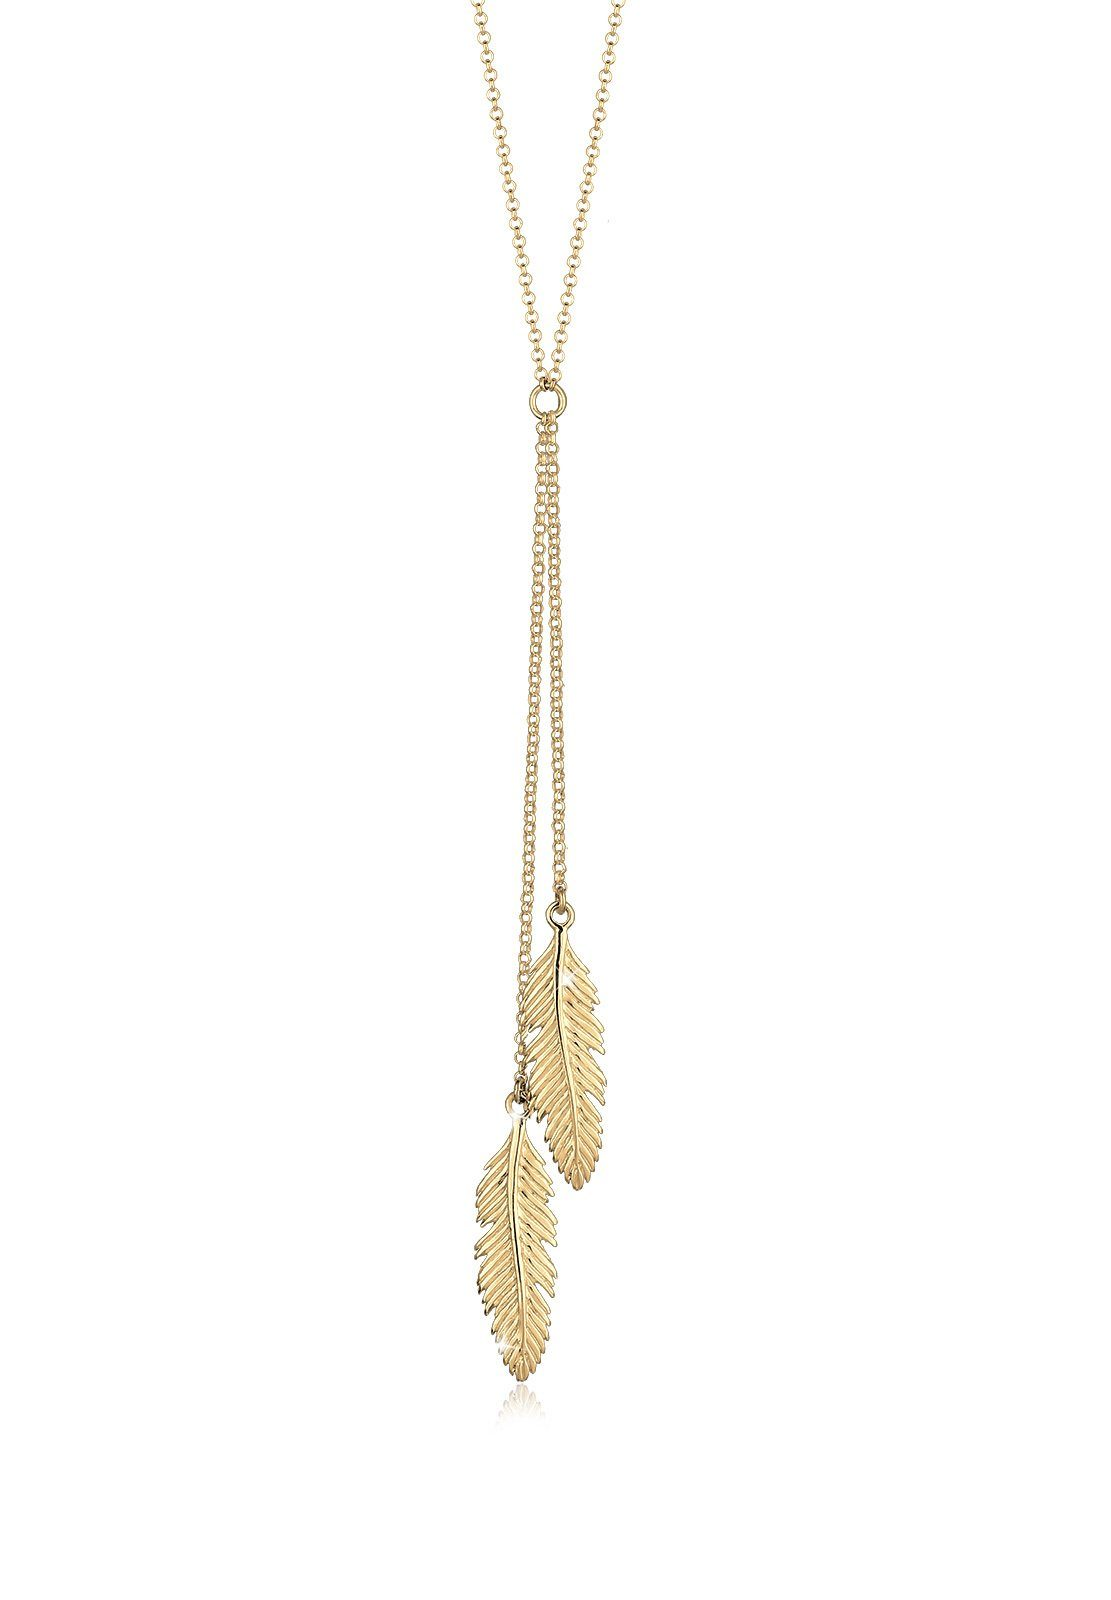 DOLCE & GABBANA Dolce & Gabbana Damen Sonnenbrille » DG4331«, goldfarben, 31706H - gold/gold